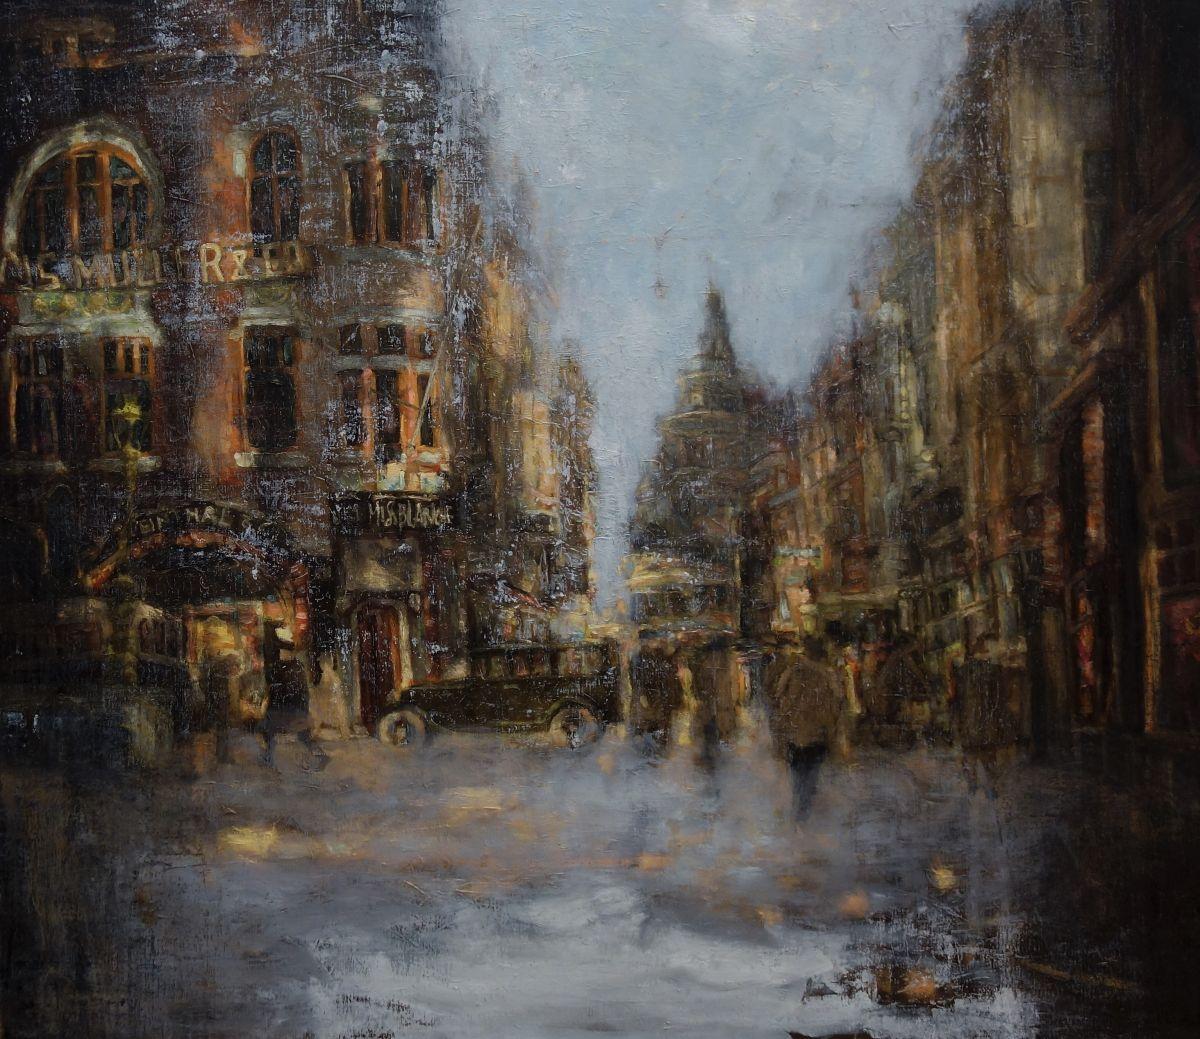 Kunst: streetscene van kunstenaar Erik-Jan Vaandering